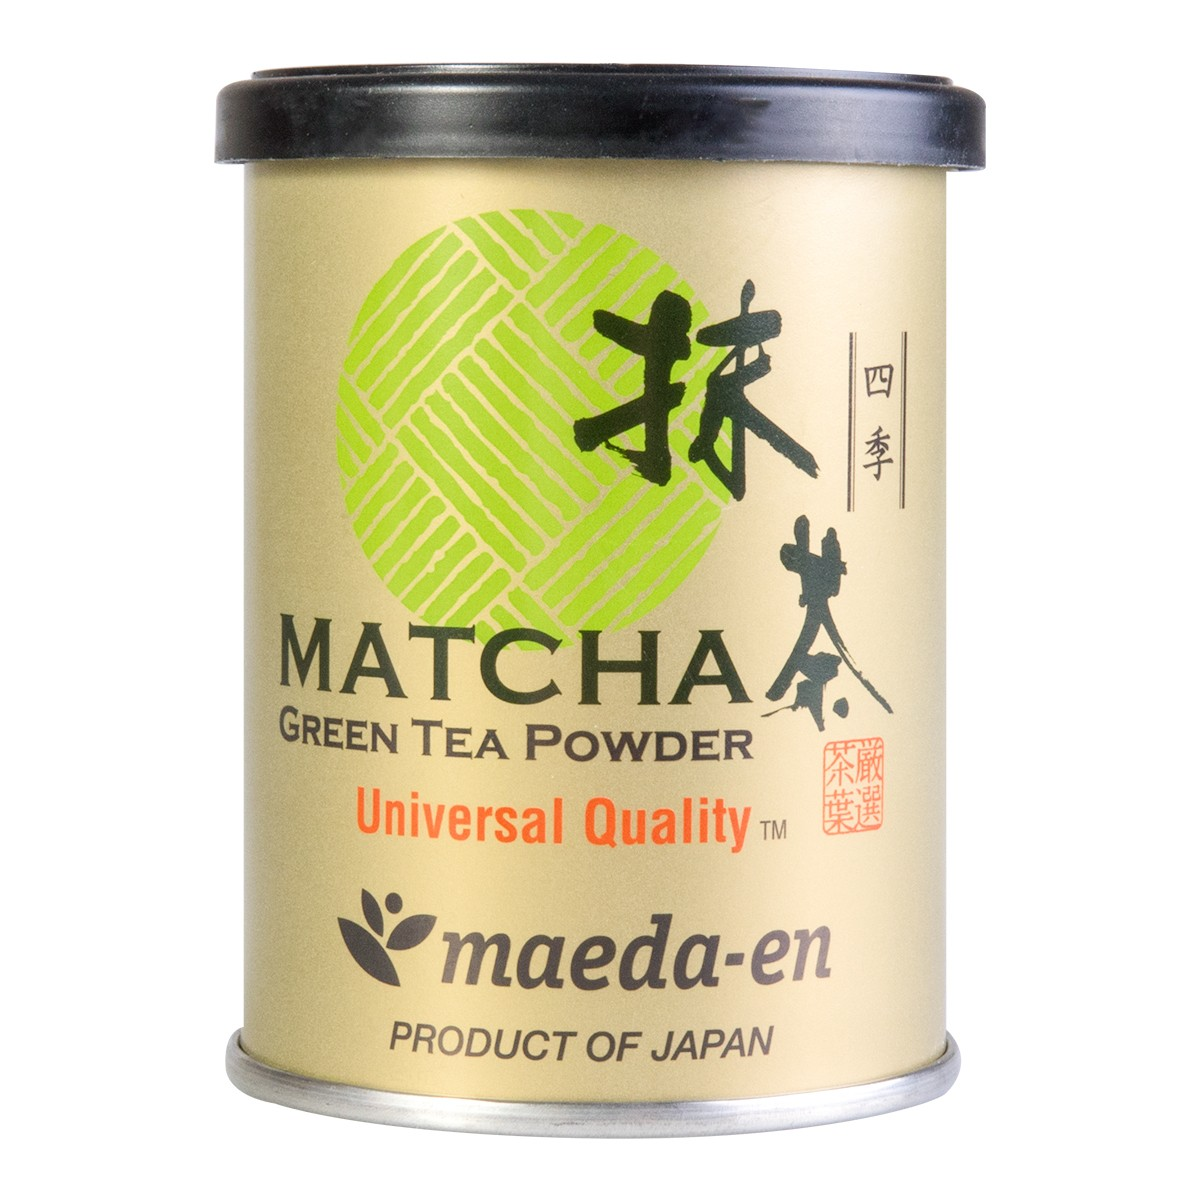 MAEDA-EN Matcha Green Tea Powder 28g